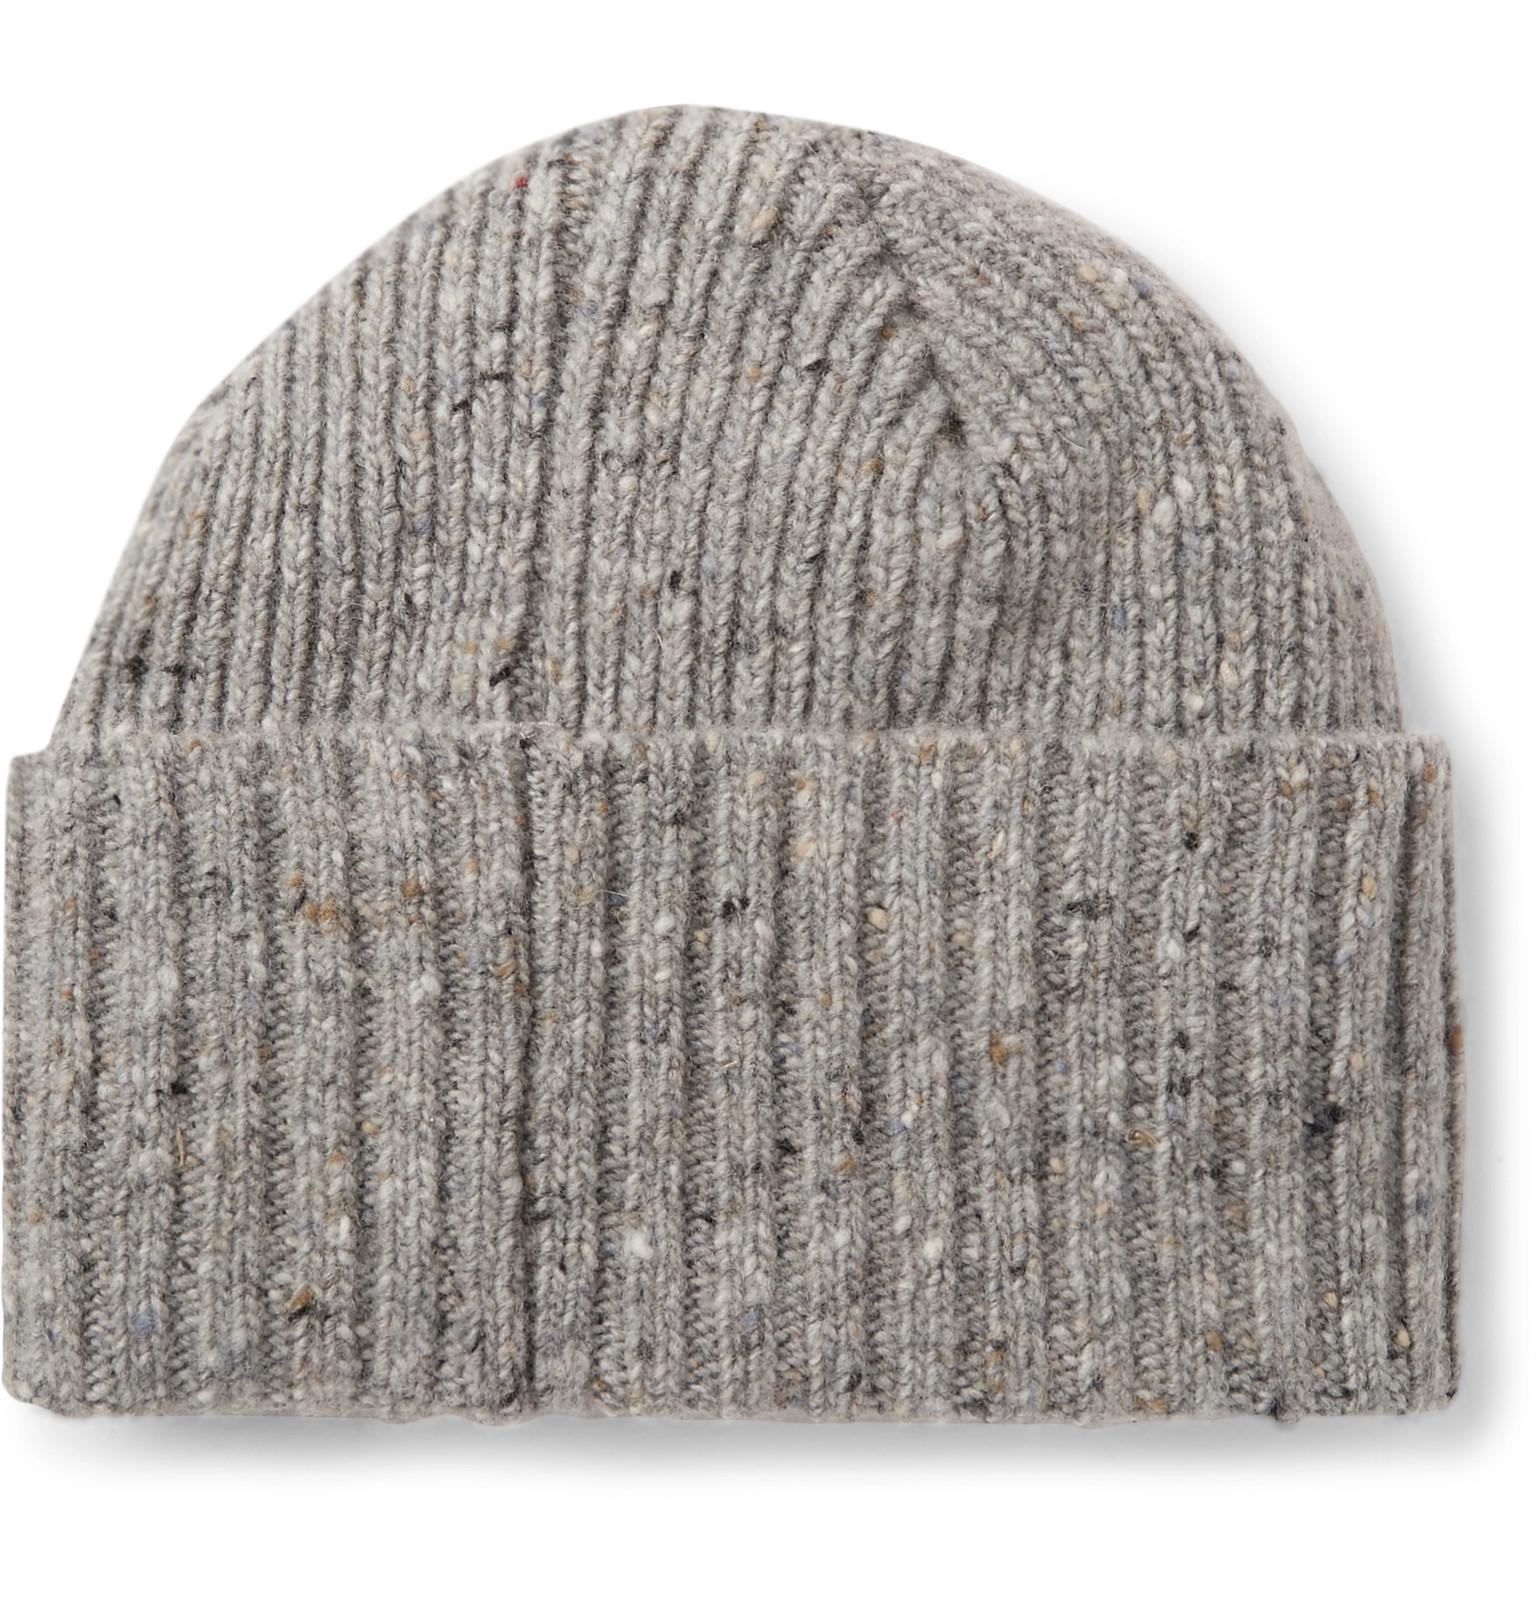 Drake s Ribbed Donegal Merino Wool Beanie in Gray for Men - Lyst aeaa39bec35b